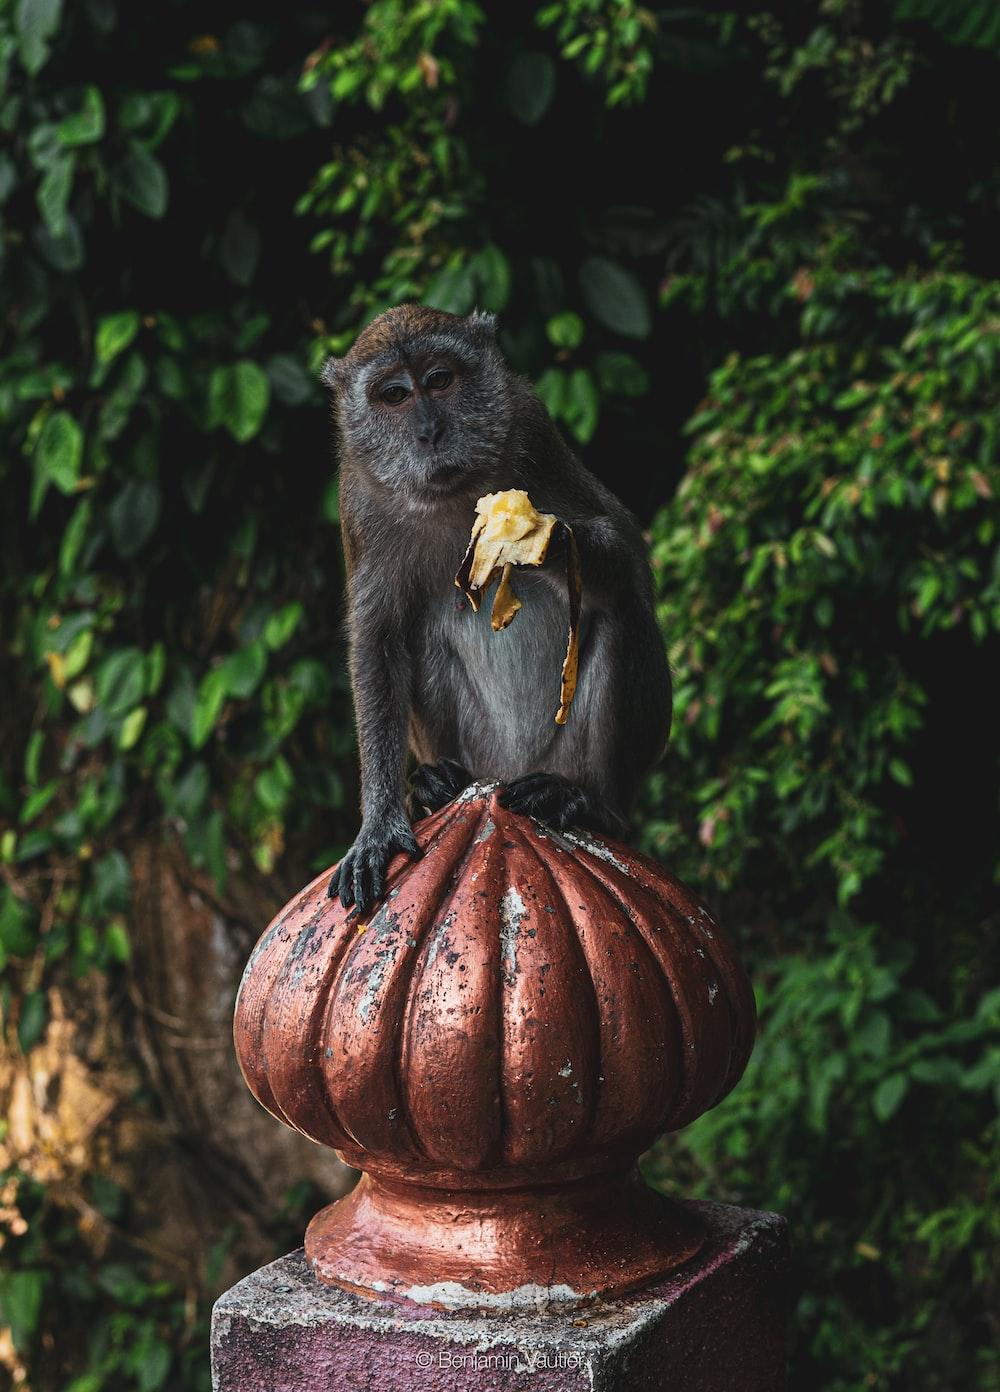 black monkey on brown pumpkin